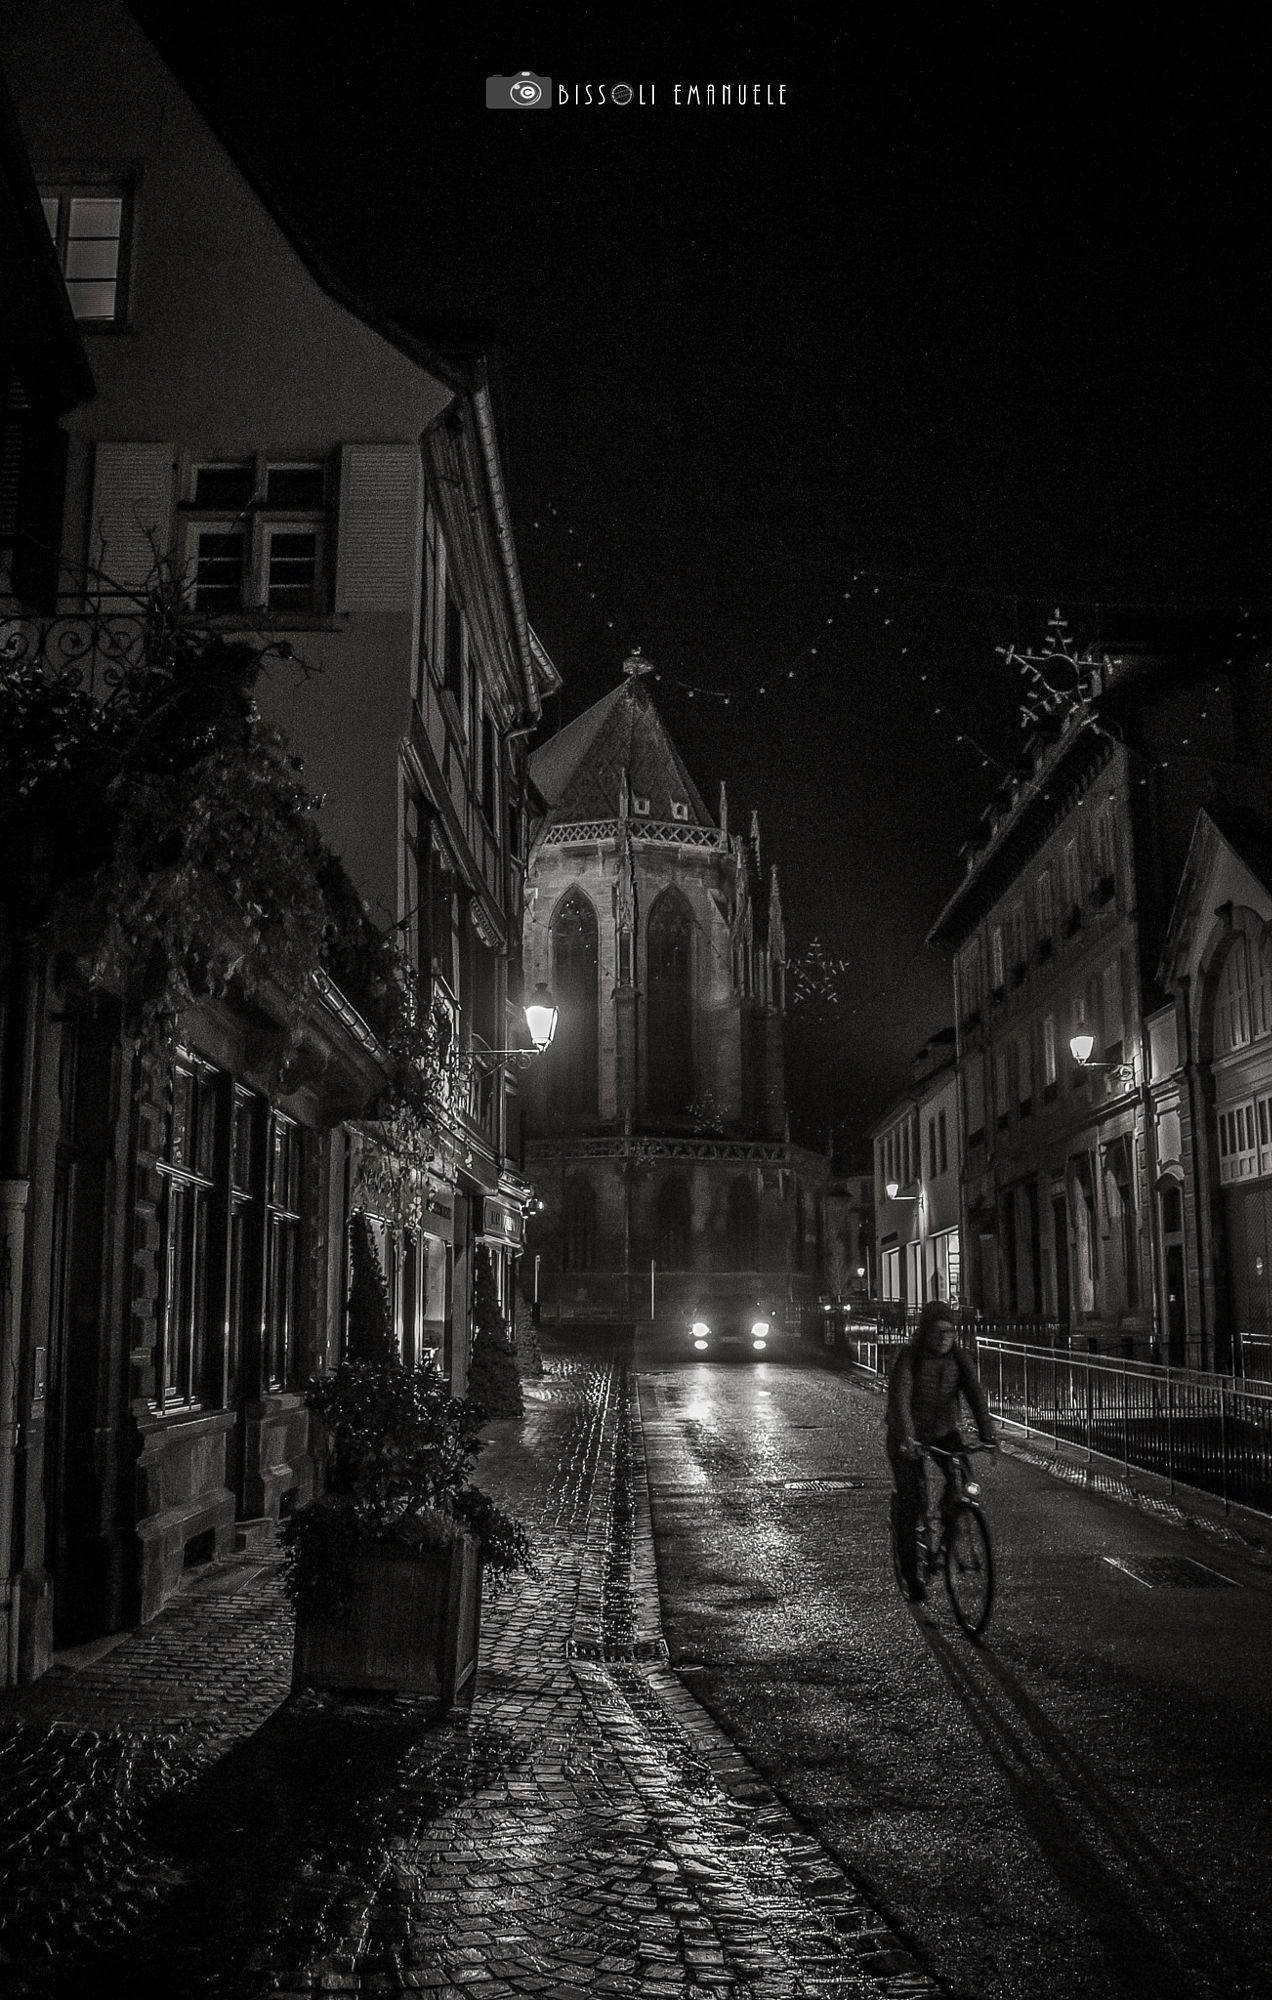 Street Photography : Rue de l'Eglise by EmanueleBissoli https://t.co/KdV3NiarlH | #streets #photography #photos #5  #photography